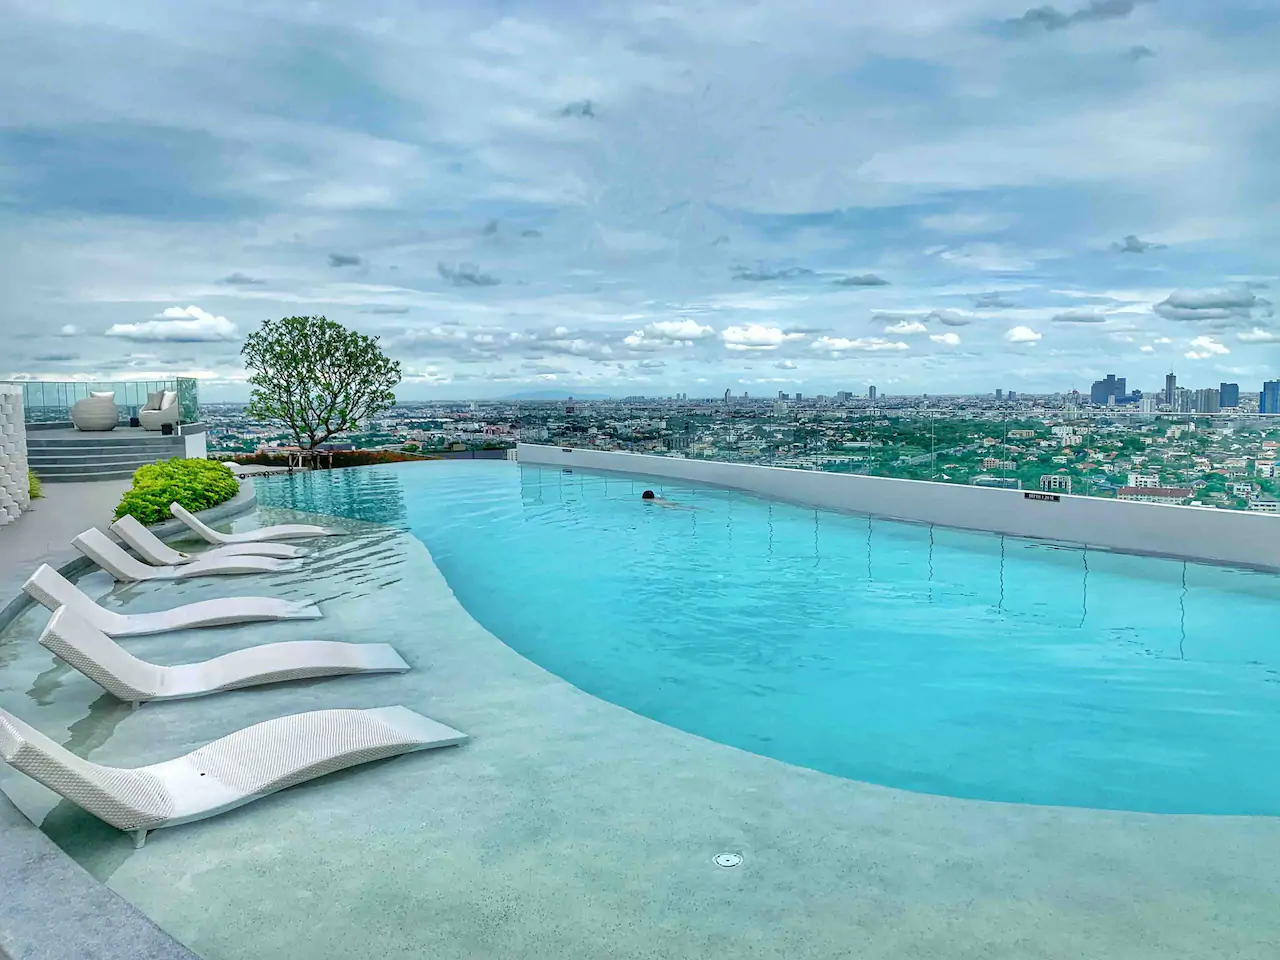 T1 Bangkok 33rd Floor Infinity Pool Stylish Condo